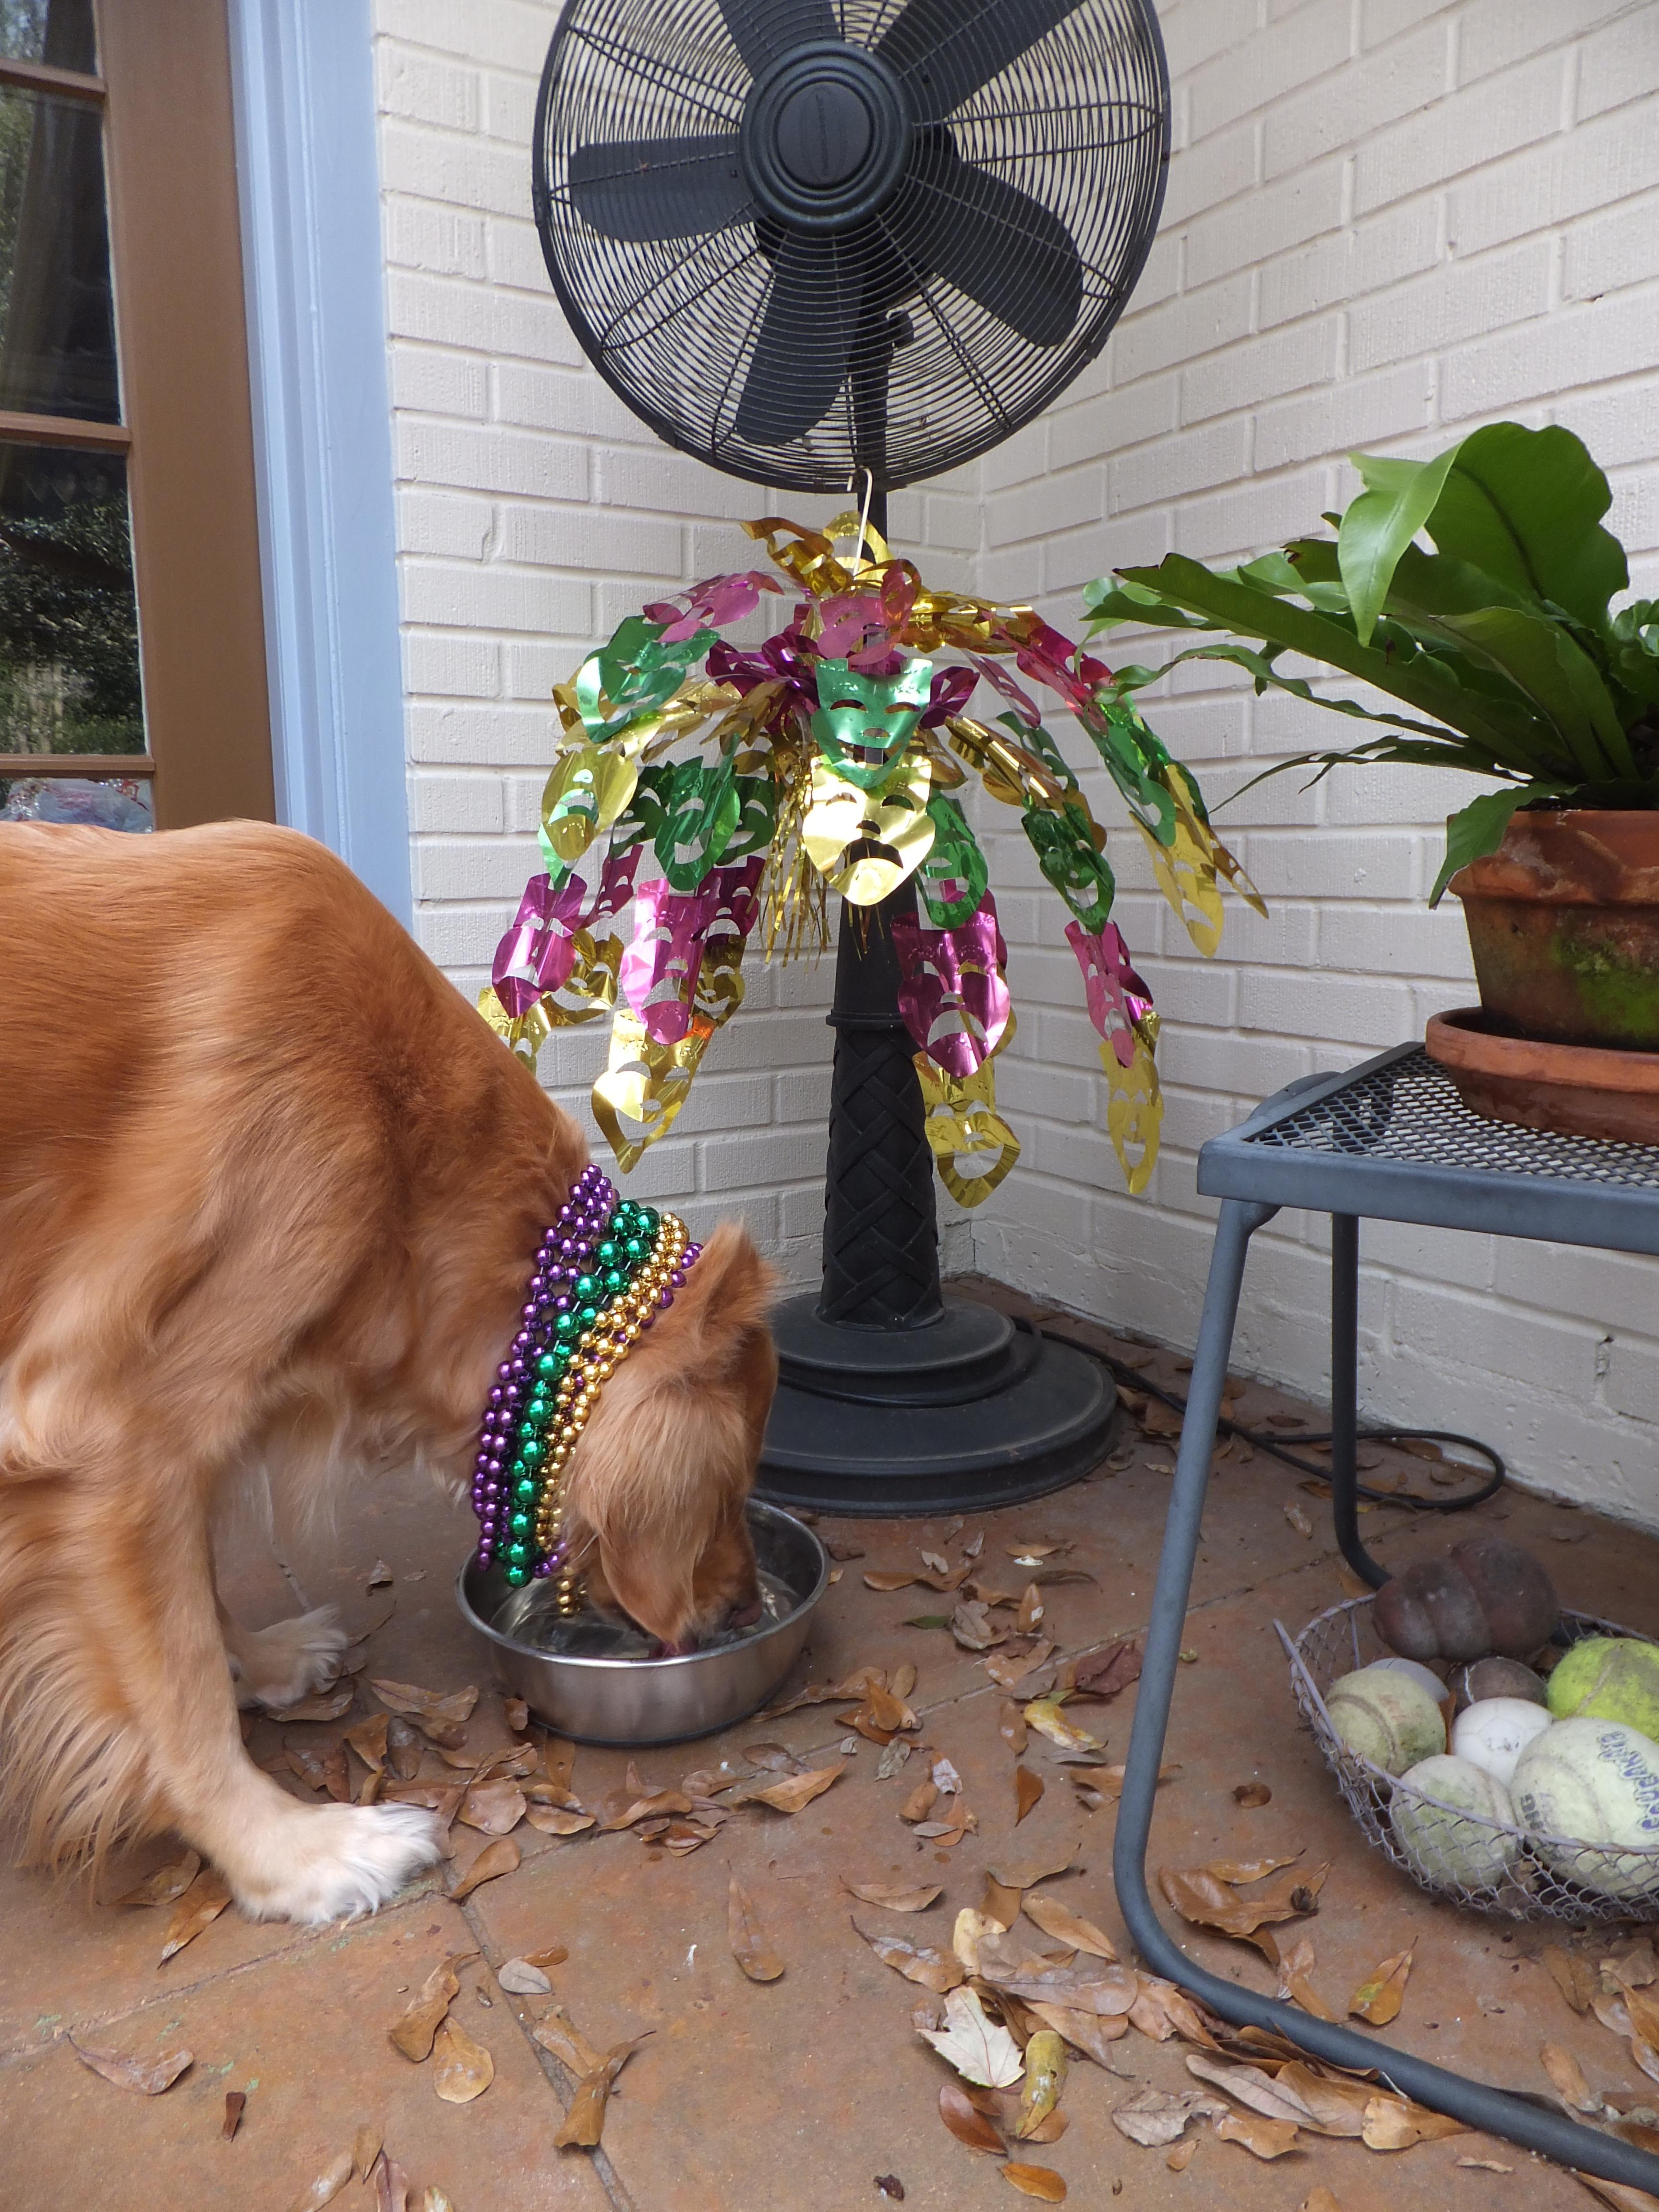 Mardi gras thek9harperlee page 2 mardi gras chandelier thek9harperlee arubaitofo Choice Image